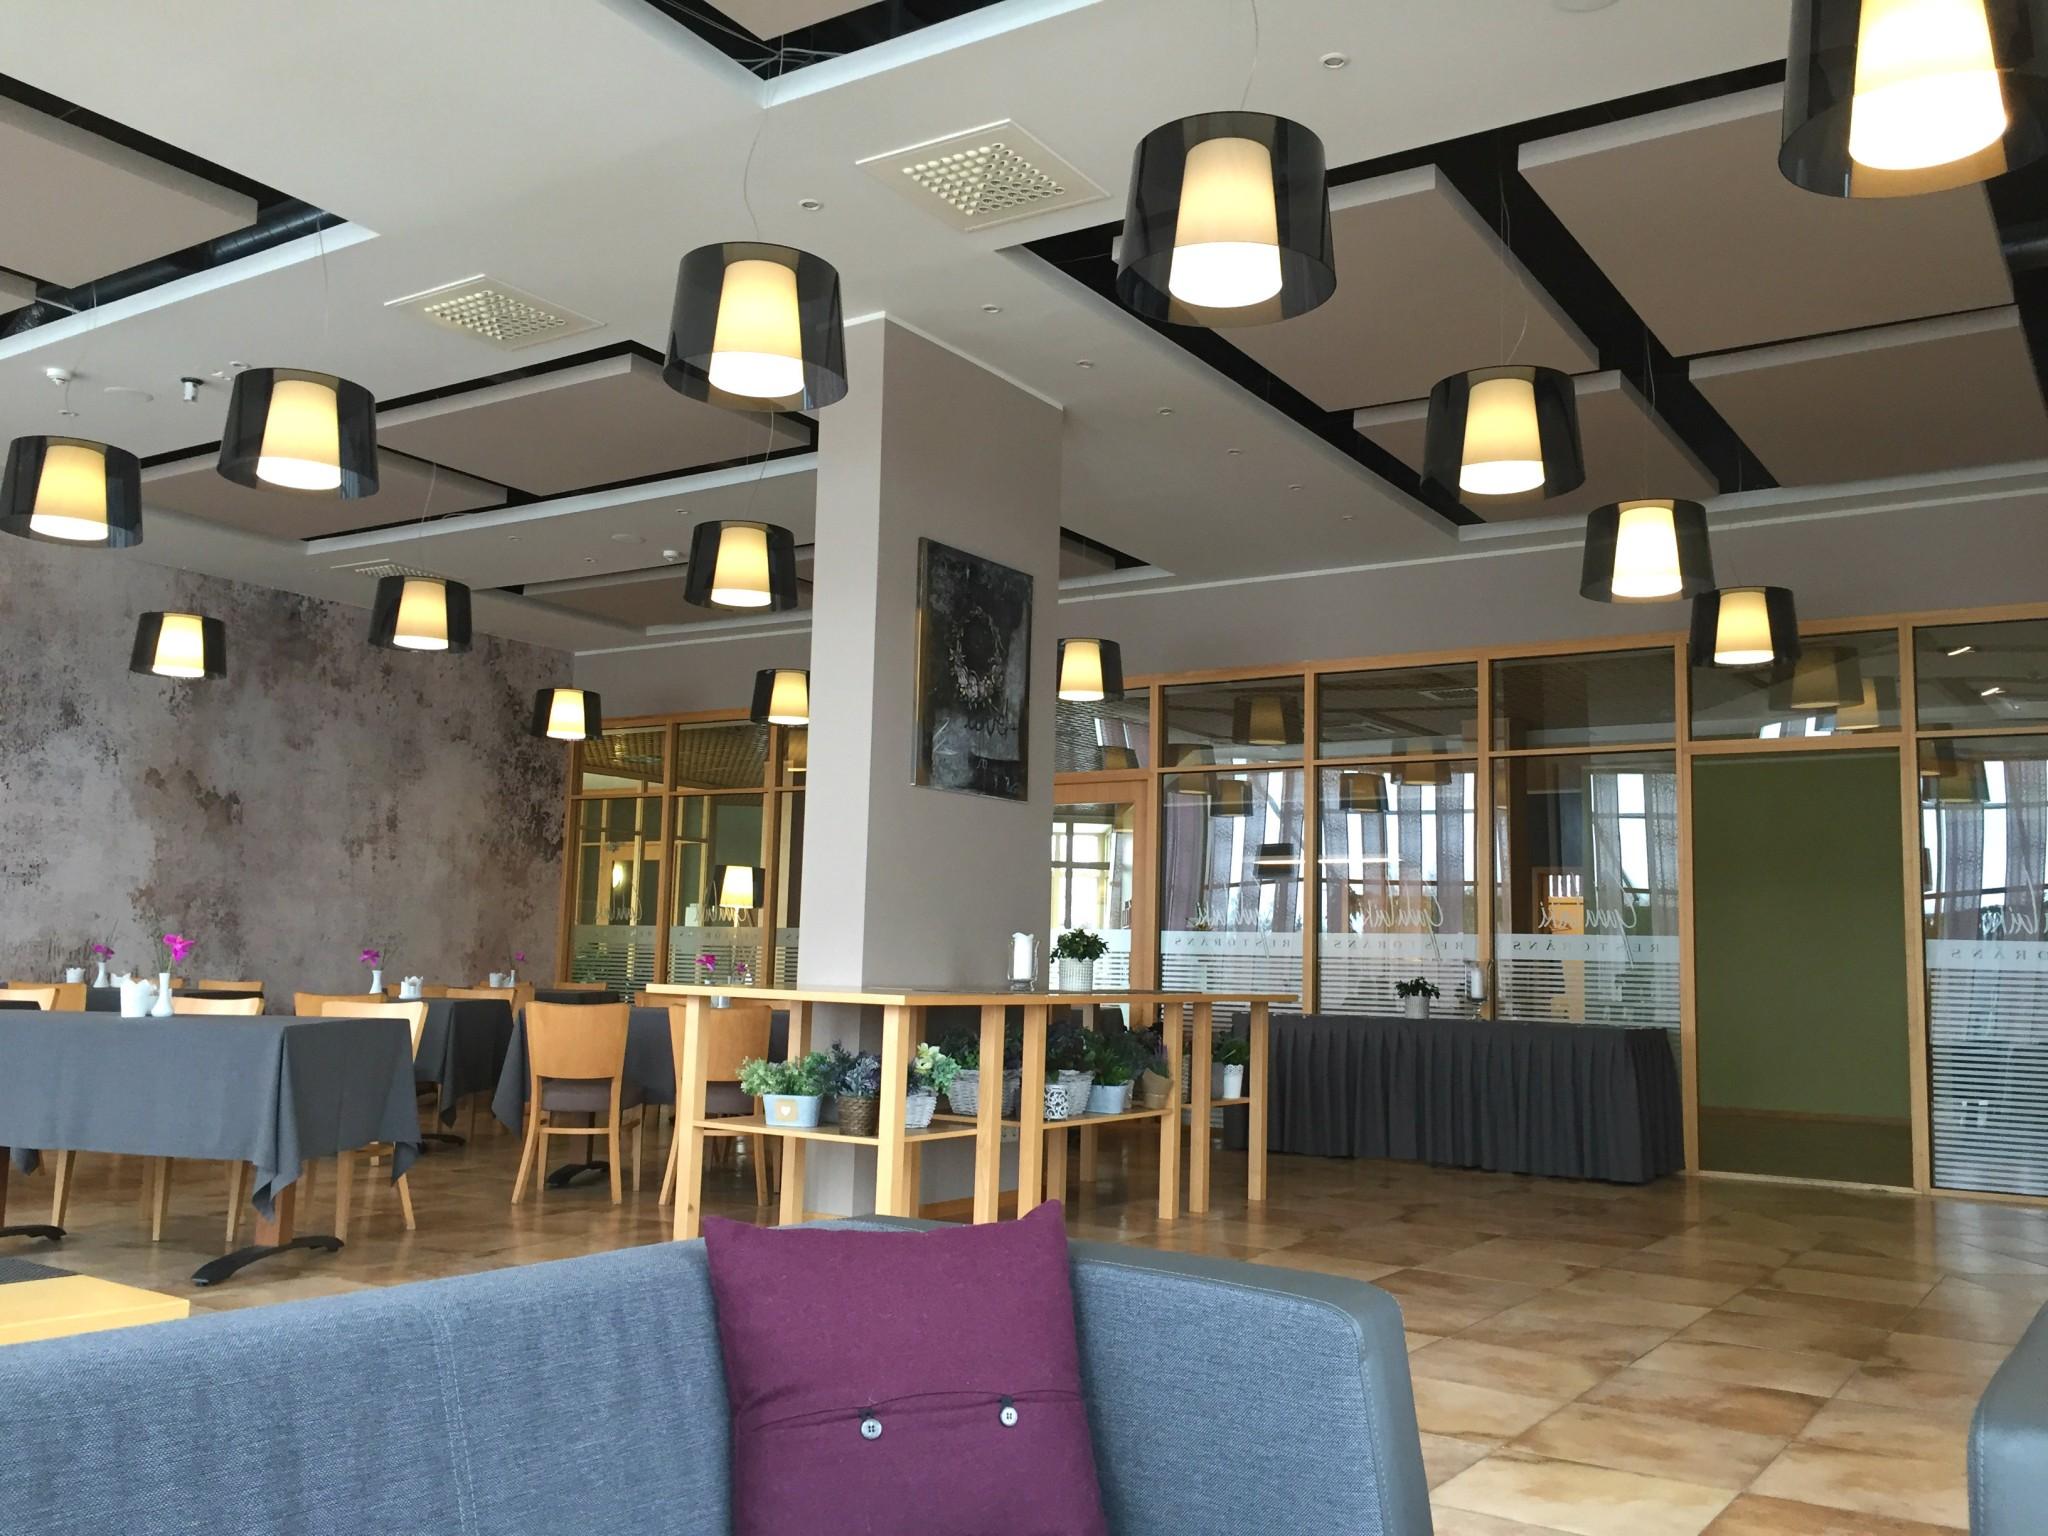 Spa hotel ezeri latvia ruokailutila